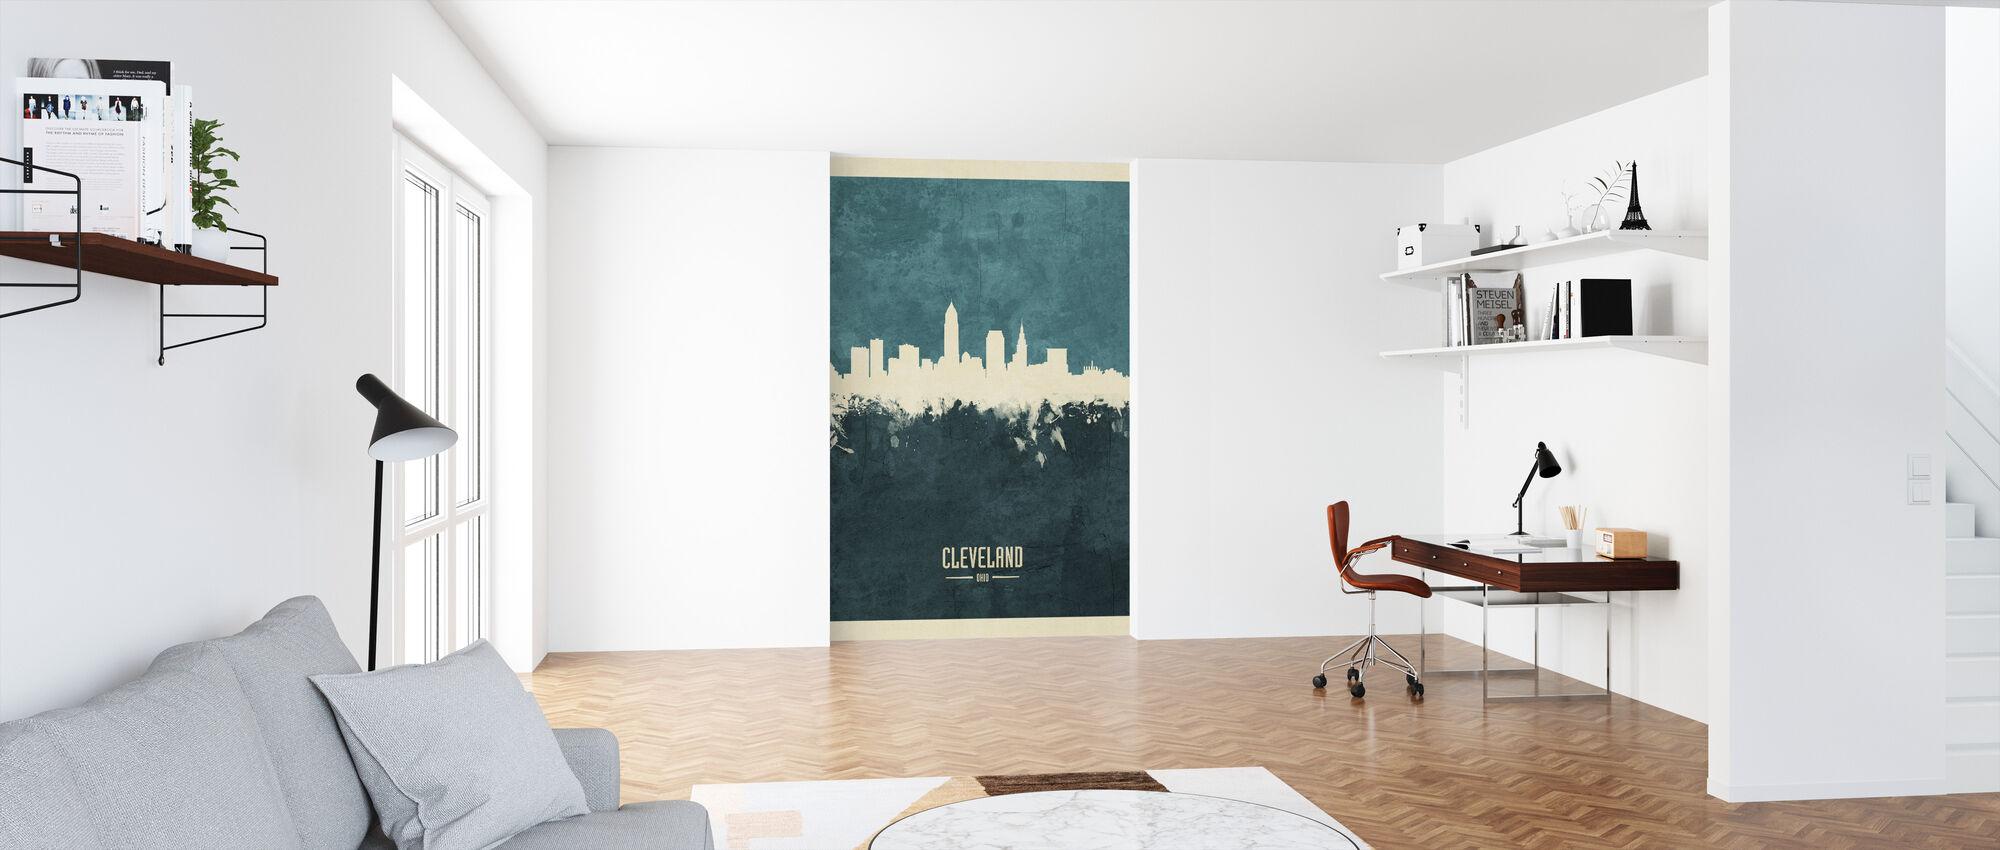 Cleveland Ohio Skyline Blue - Wallpaper - Office